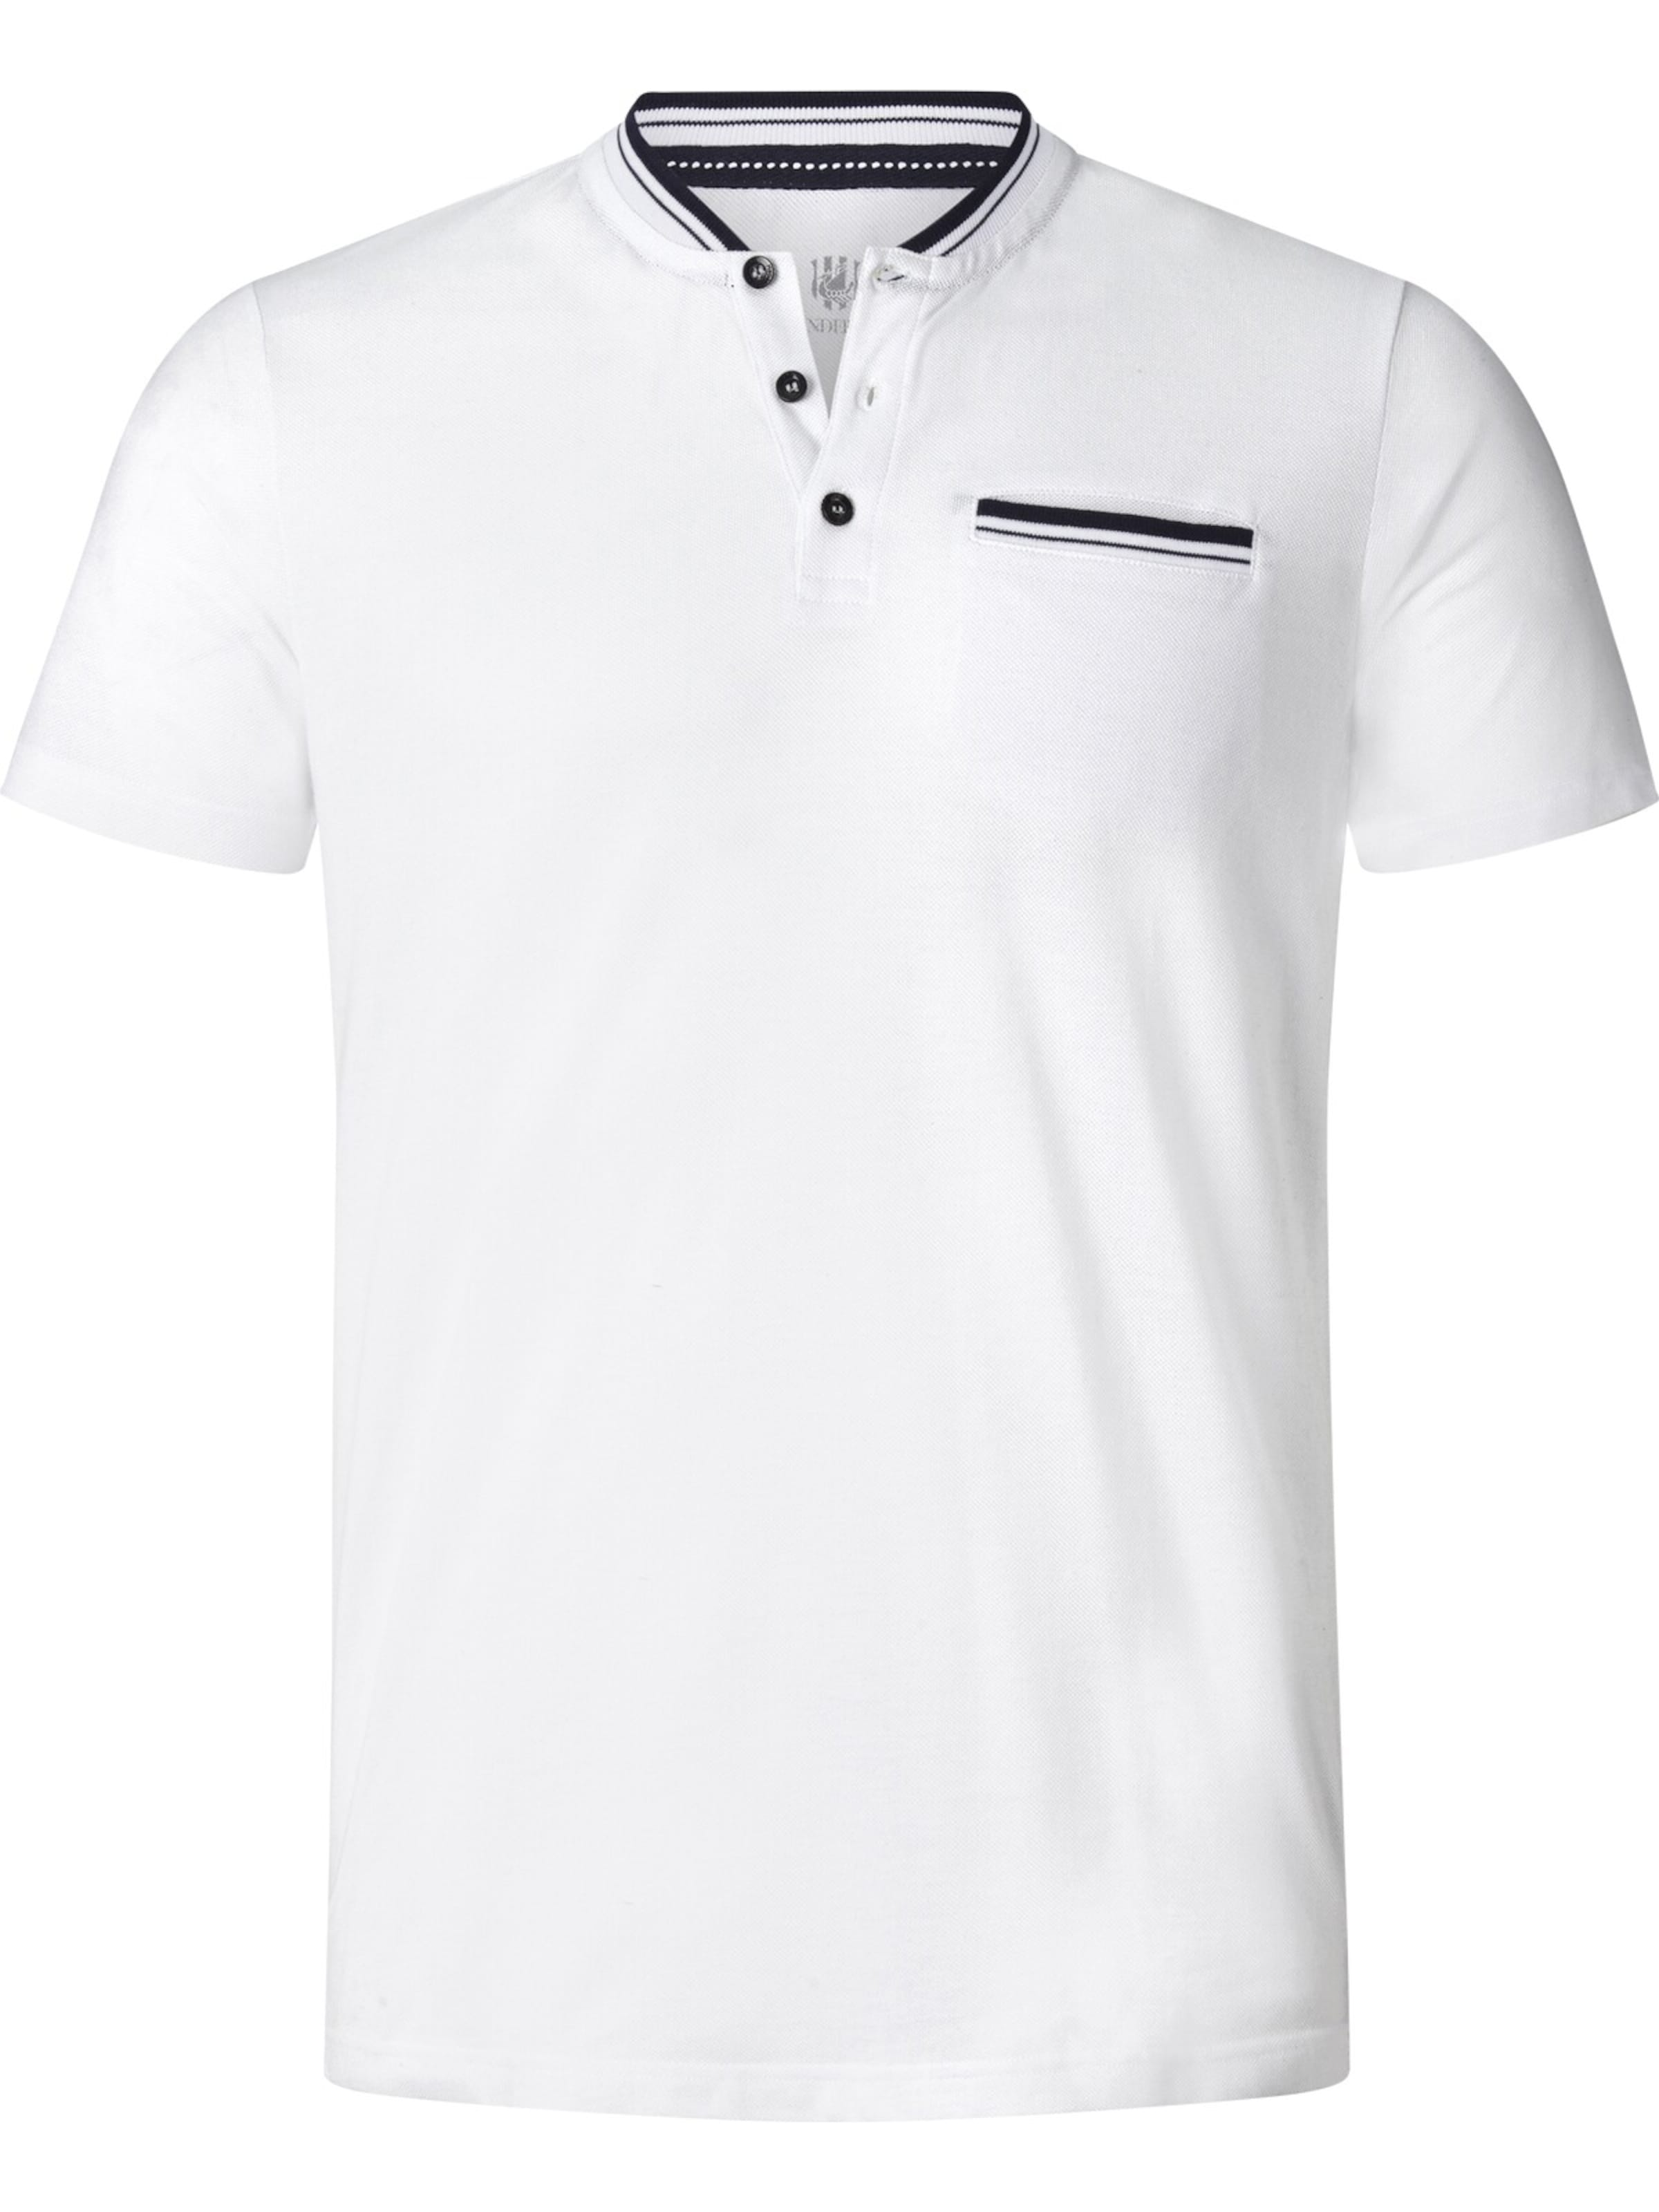 shirt Weiß T Jan Tieki Vanderstorm ' In vm0wnNy8O